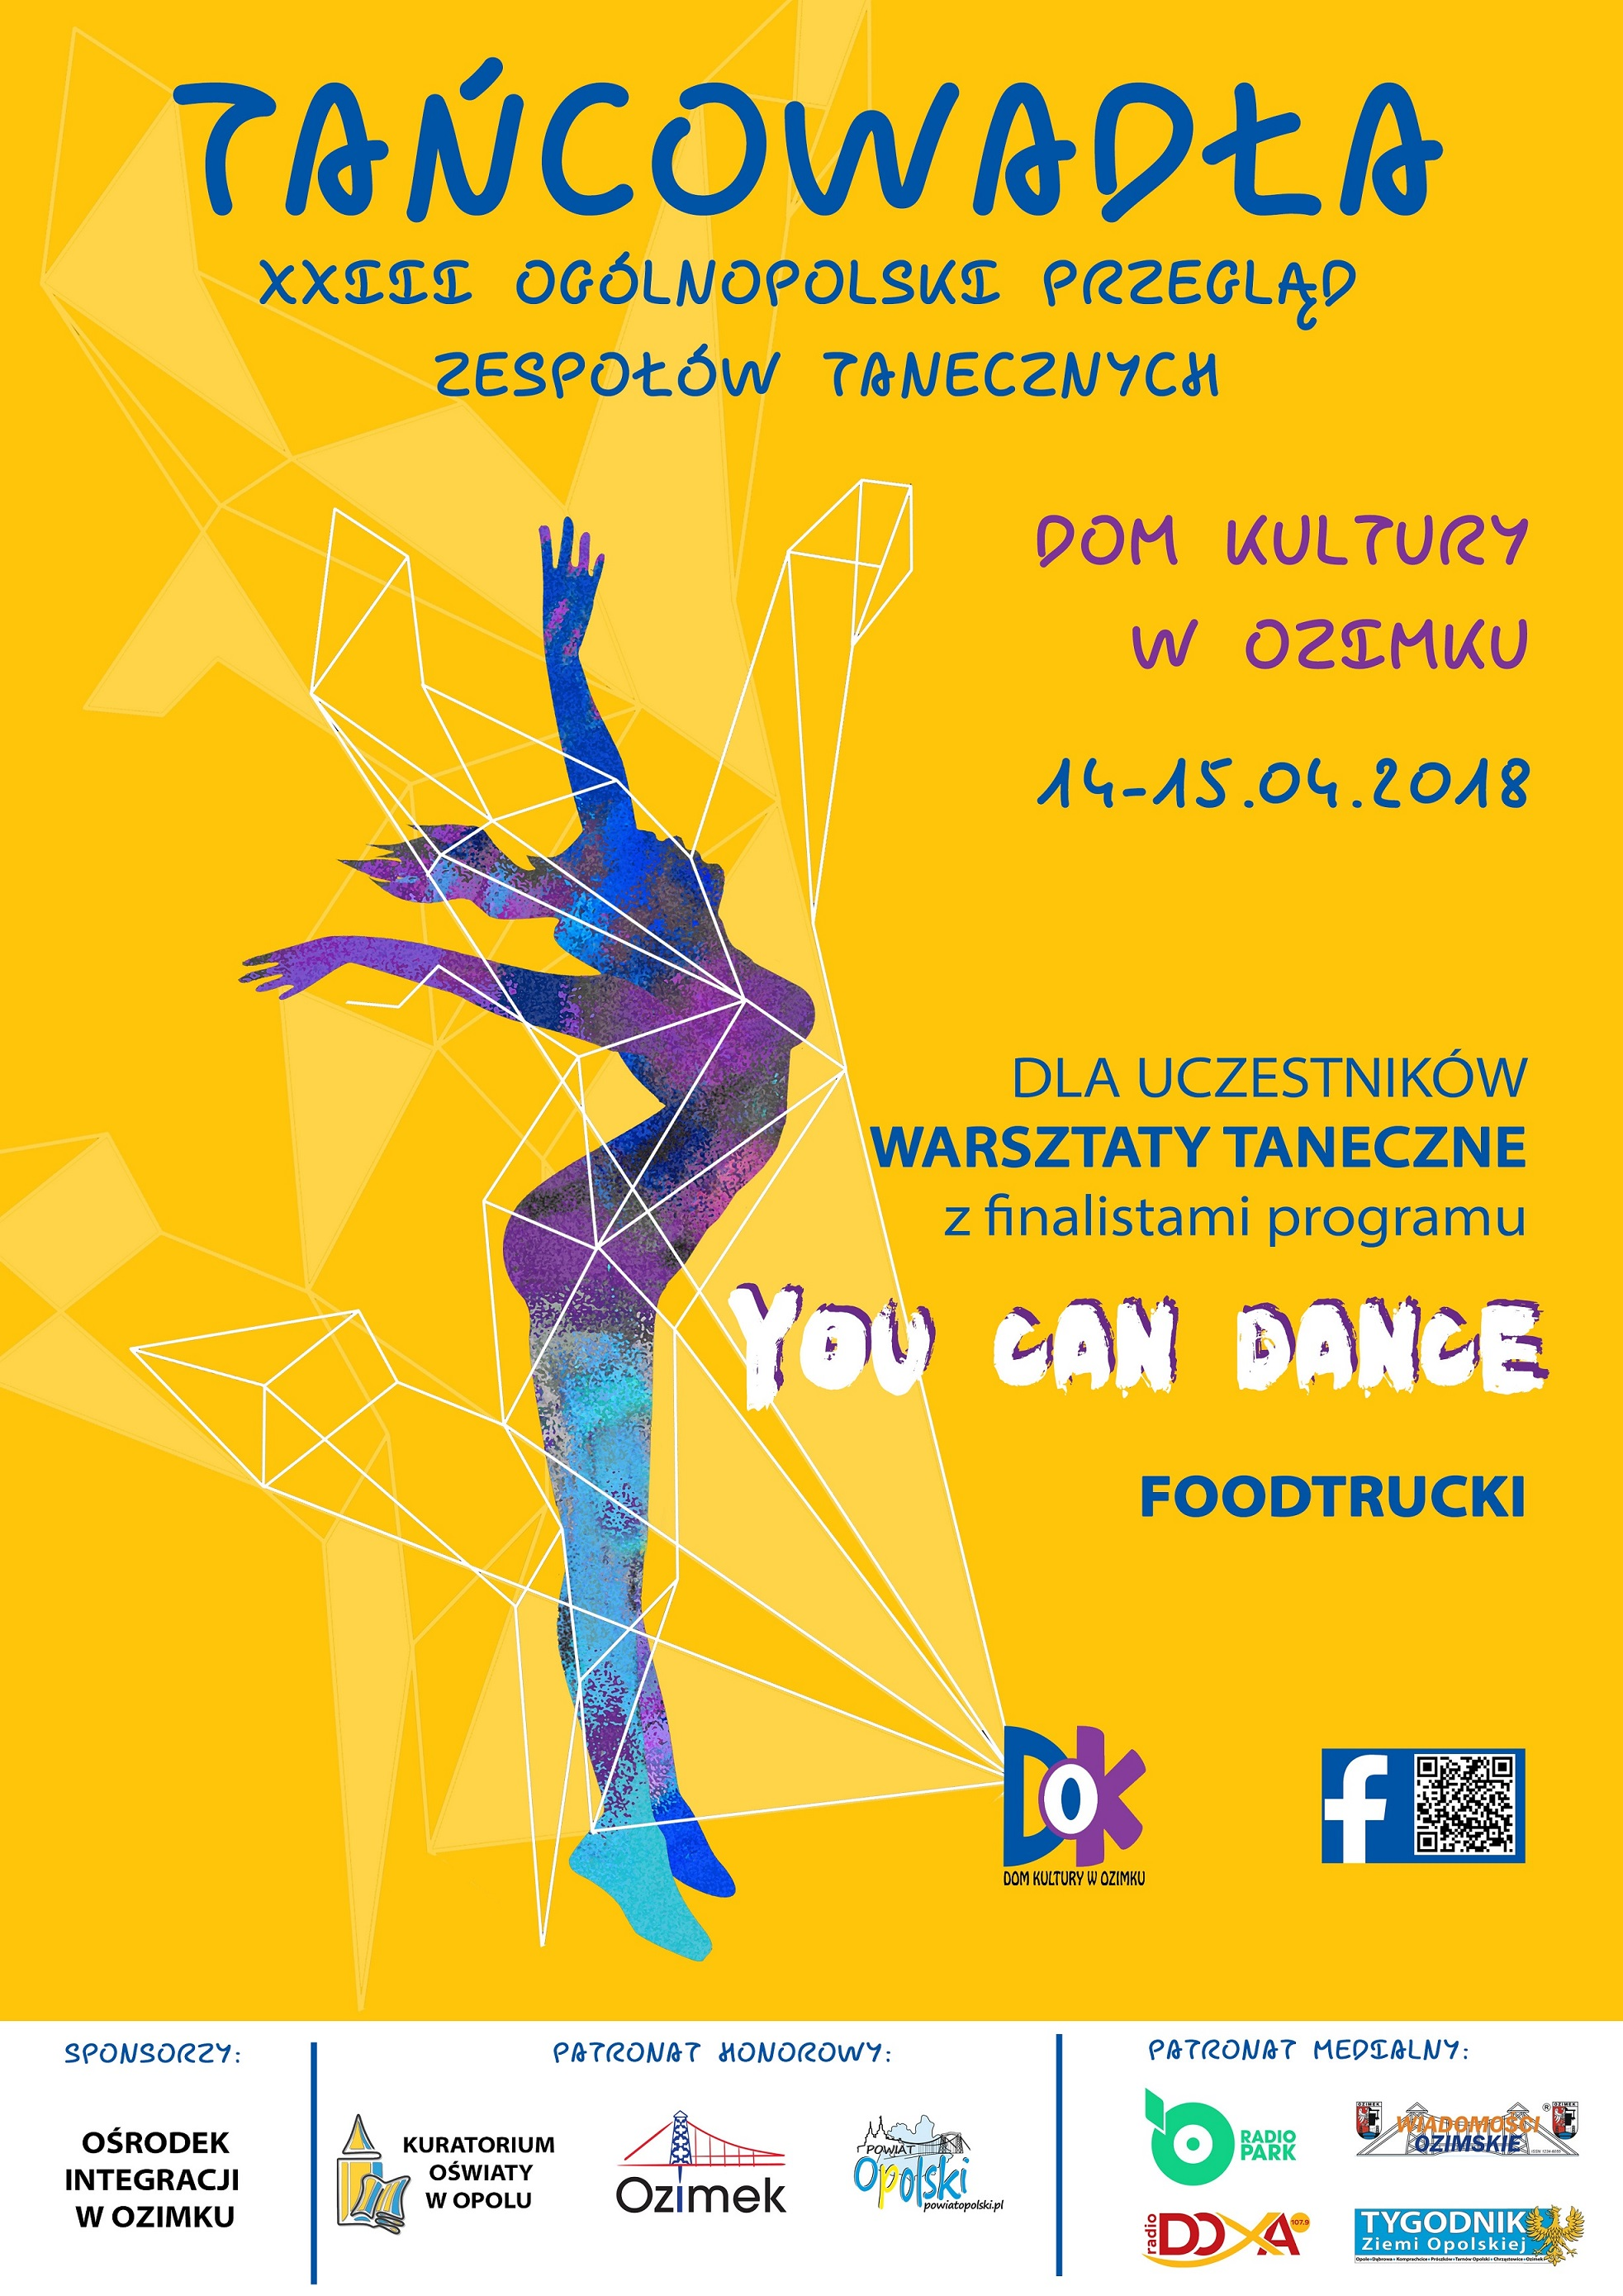 Plakat 'Tańcowadła' 2018 [materiały organizatora]